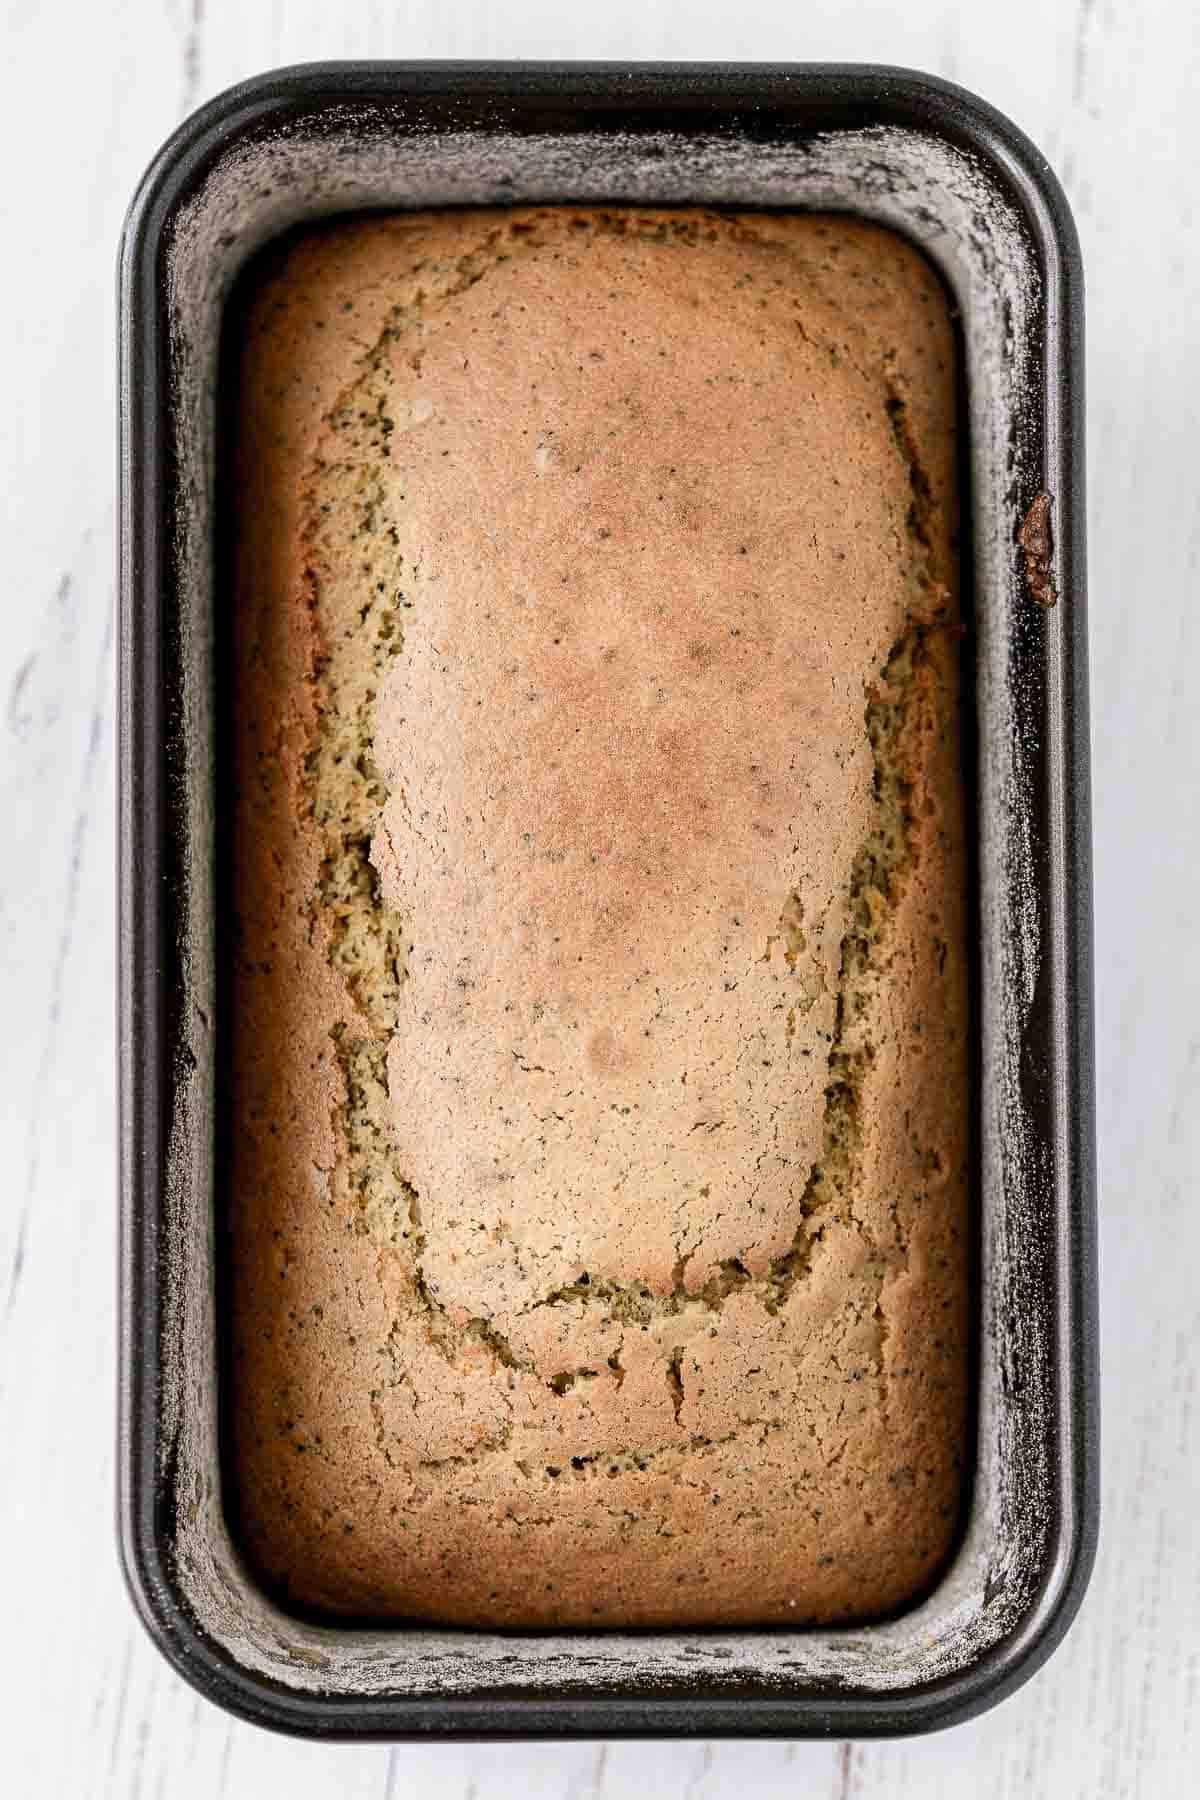 Top of a lemon poppy seed load baked in a bread pan.